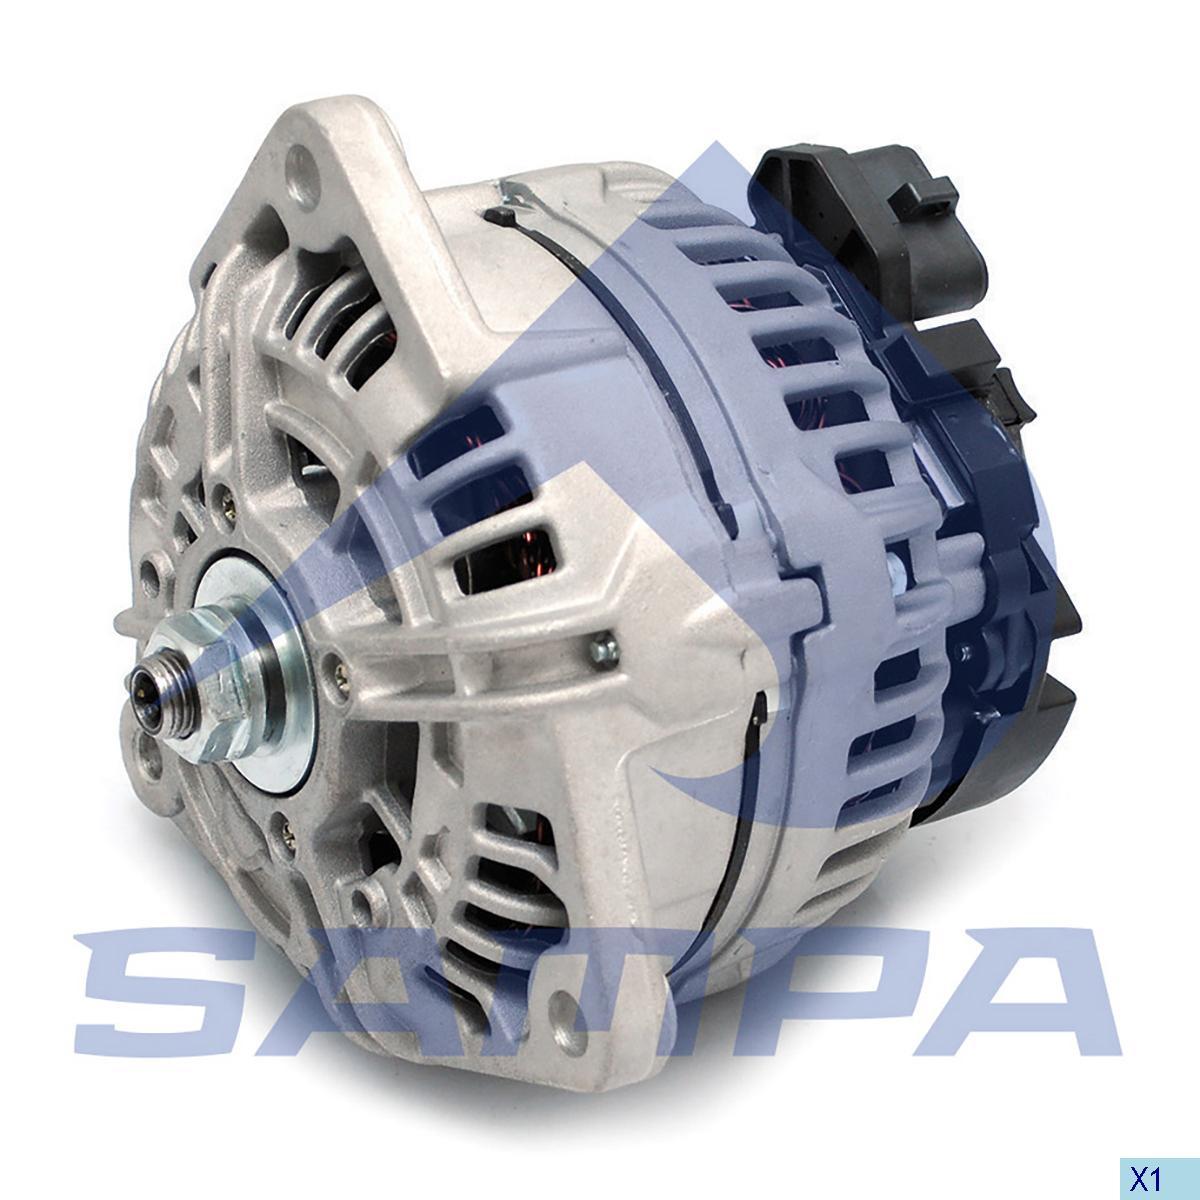 Alternator, Man, Electric System